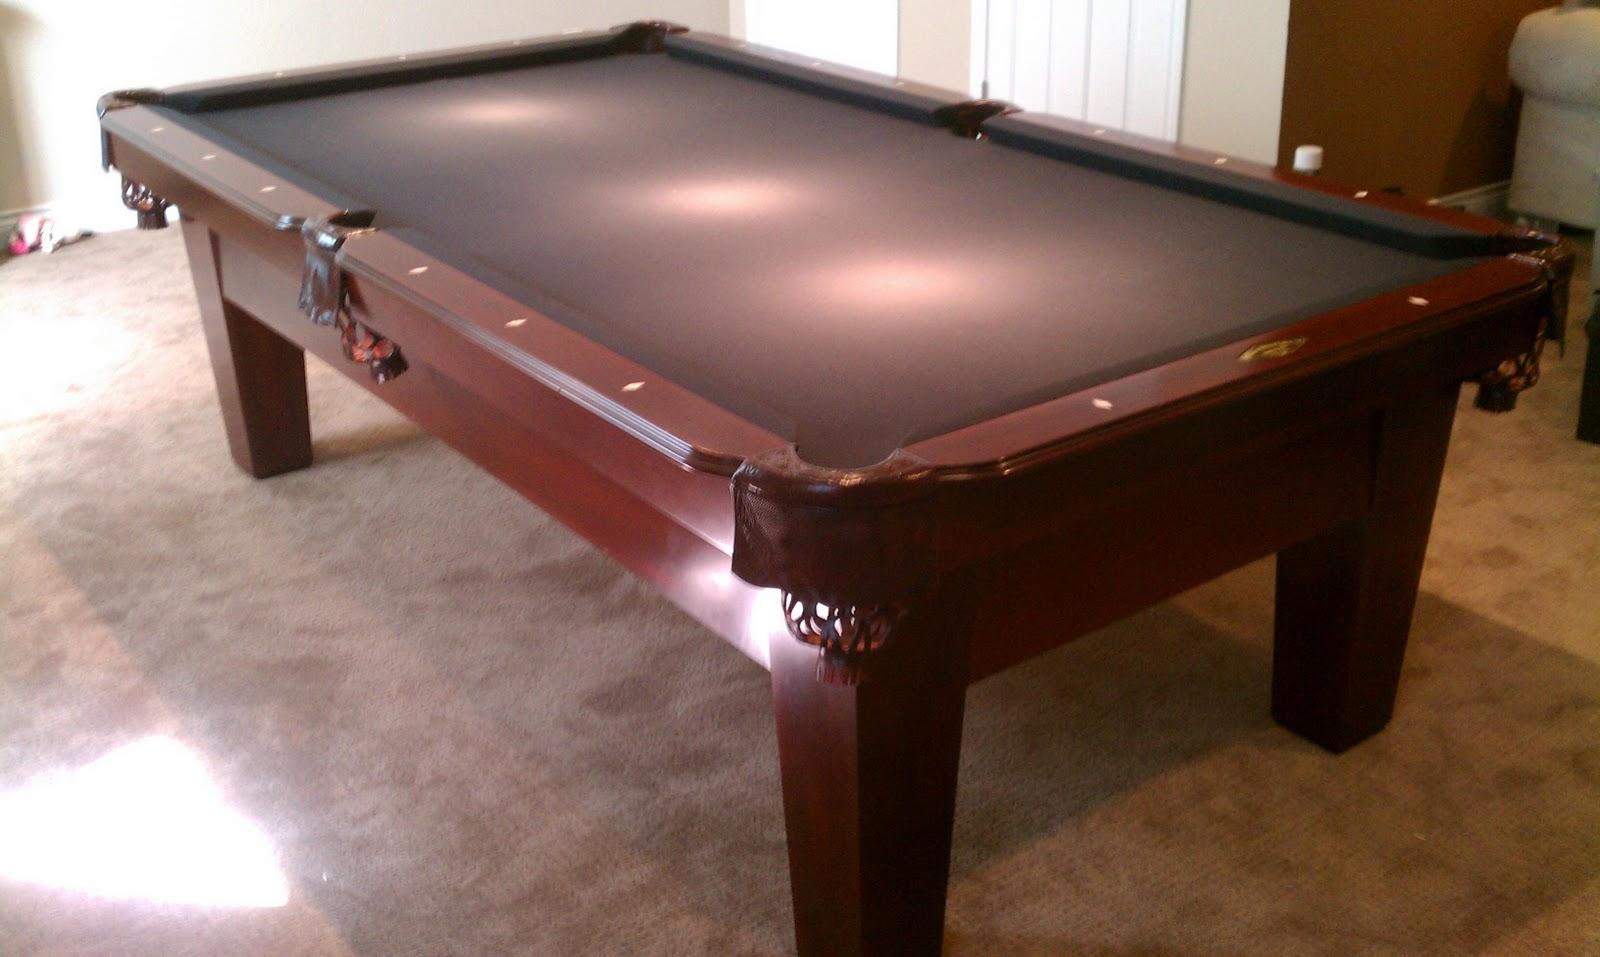 Big Break Billiards Proline Billiards Pool Table - Connelly pool table review